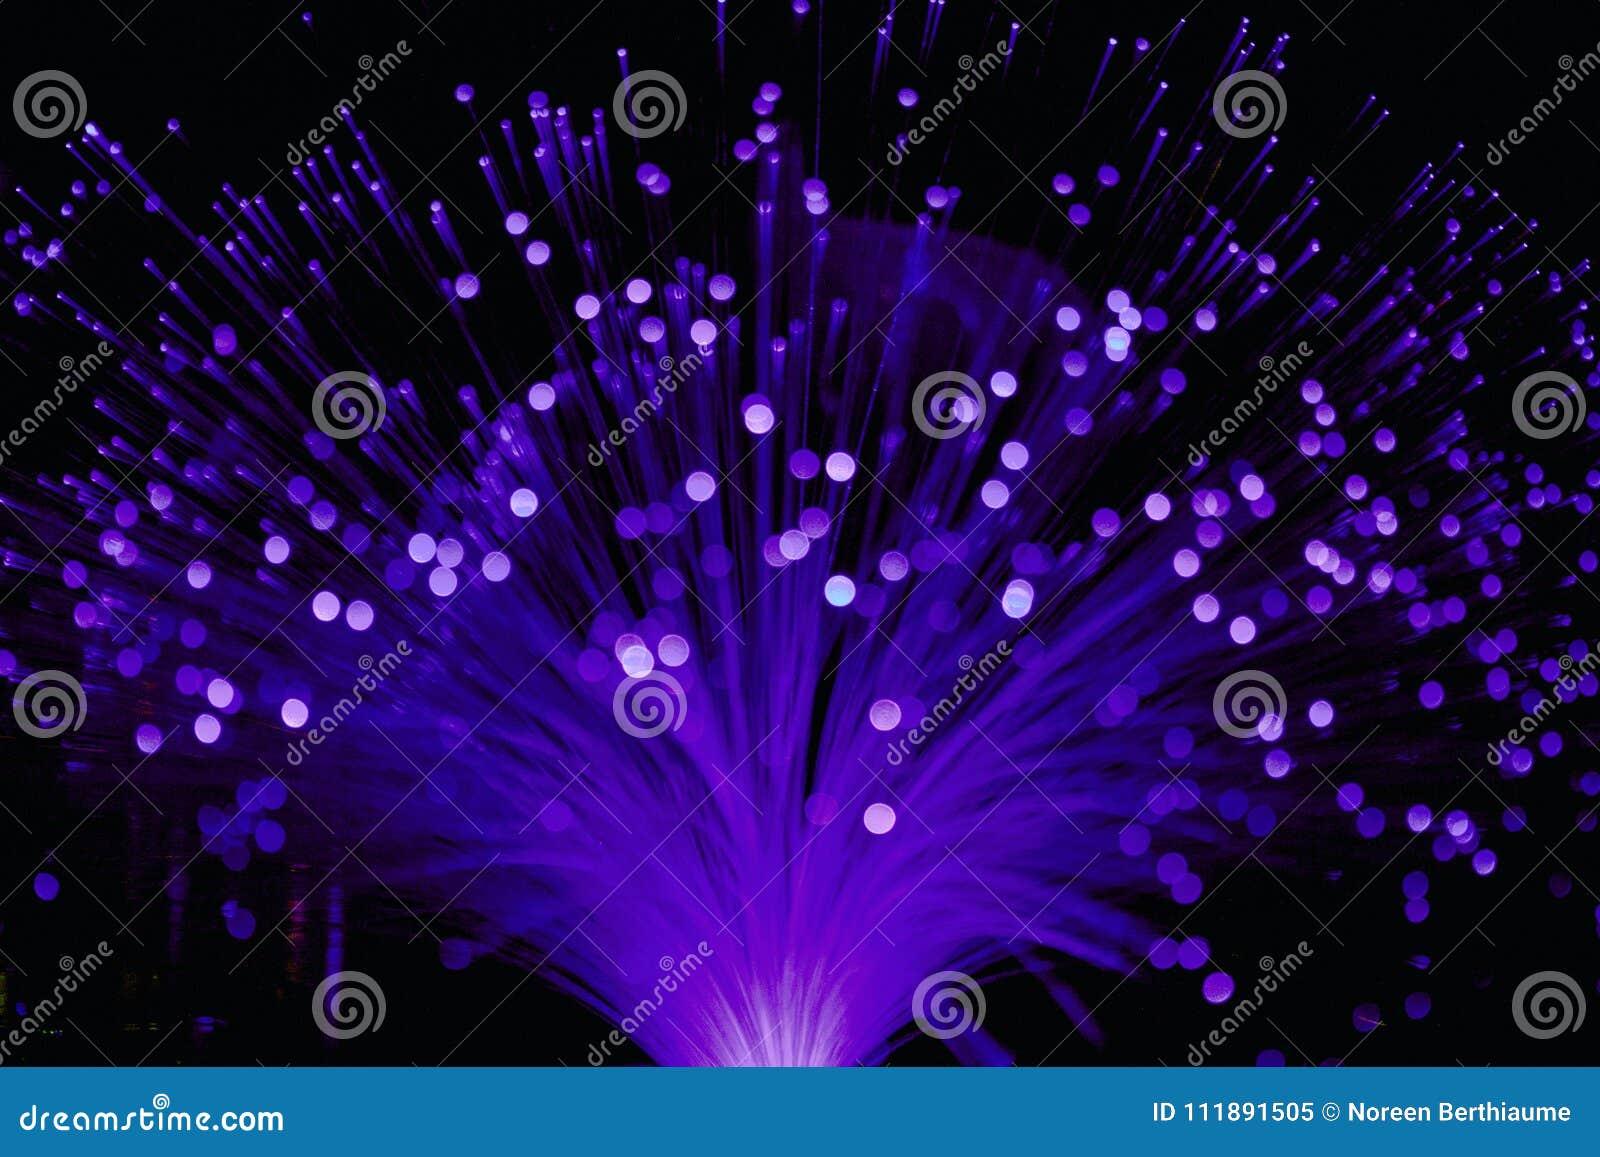 Ultraviolet Fiber Optic Lamp Light